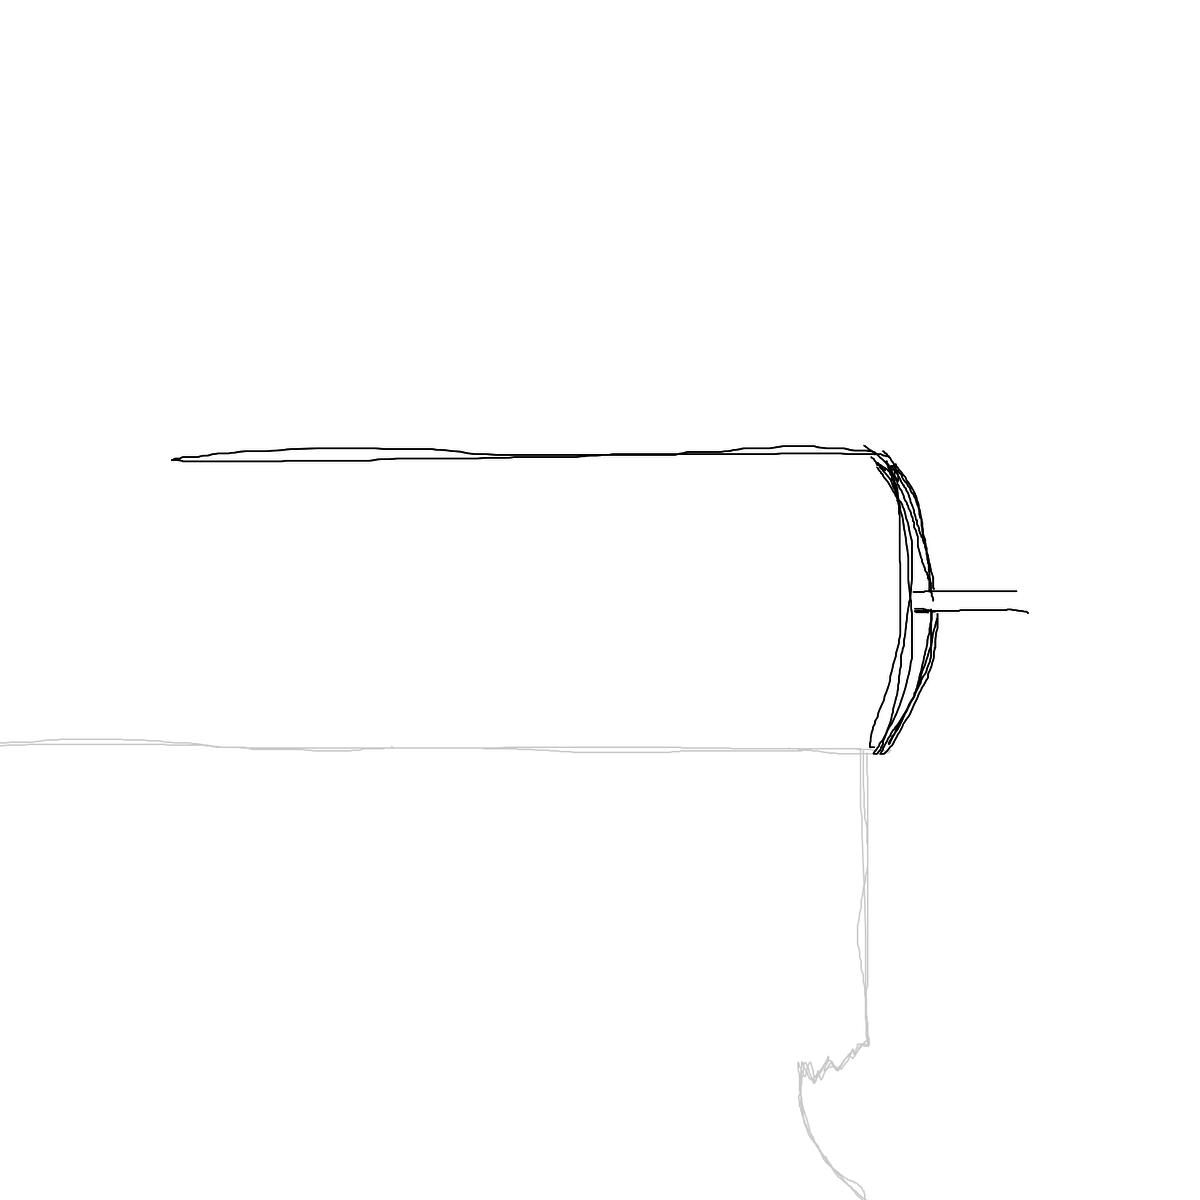 BAAAM drawing#10741 lat:51.0363883972168000lng: -114.0524444580078100